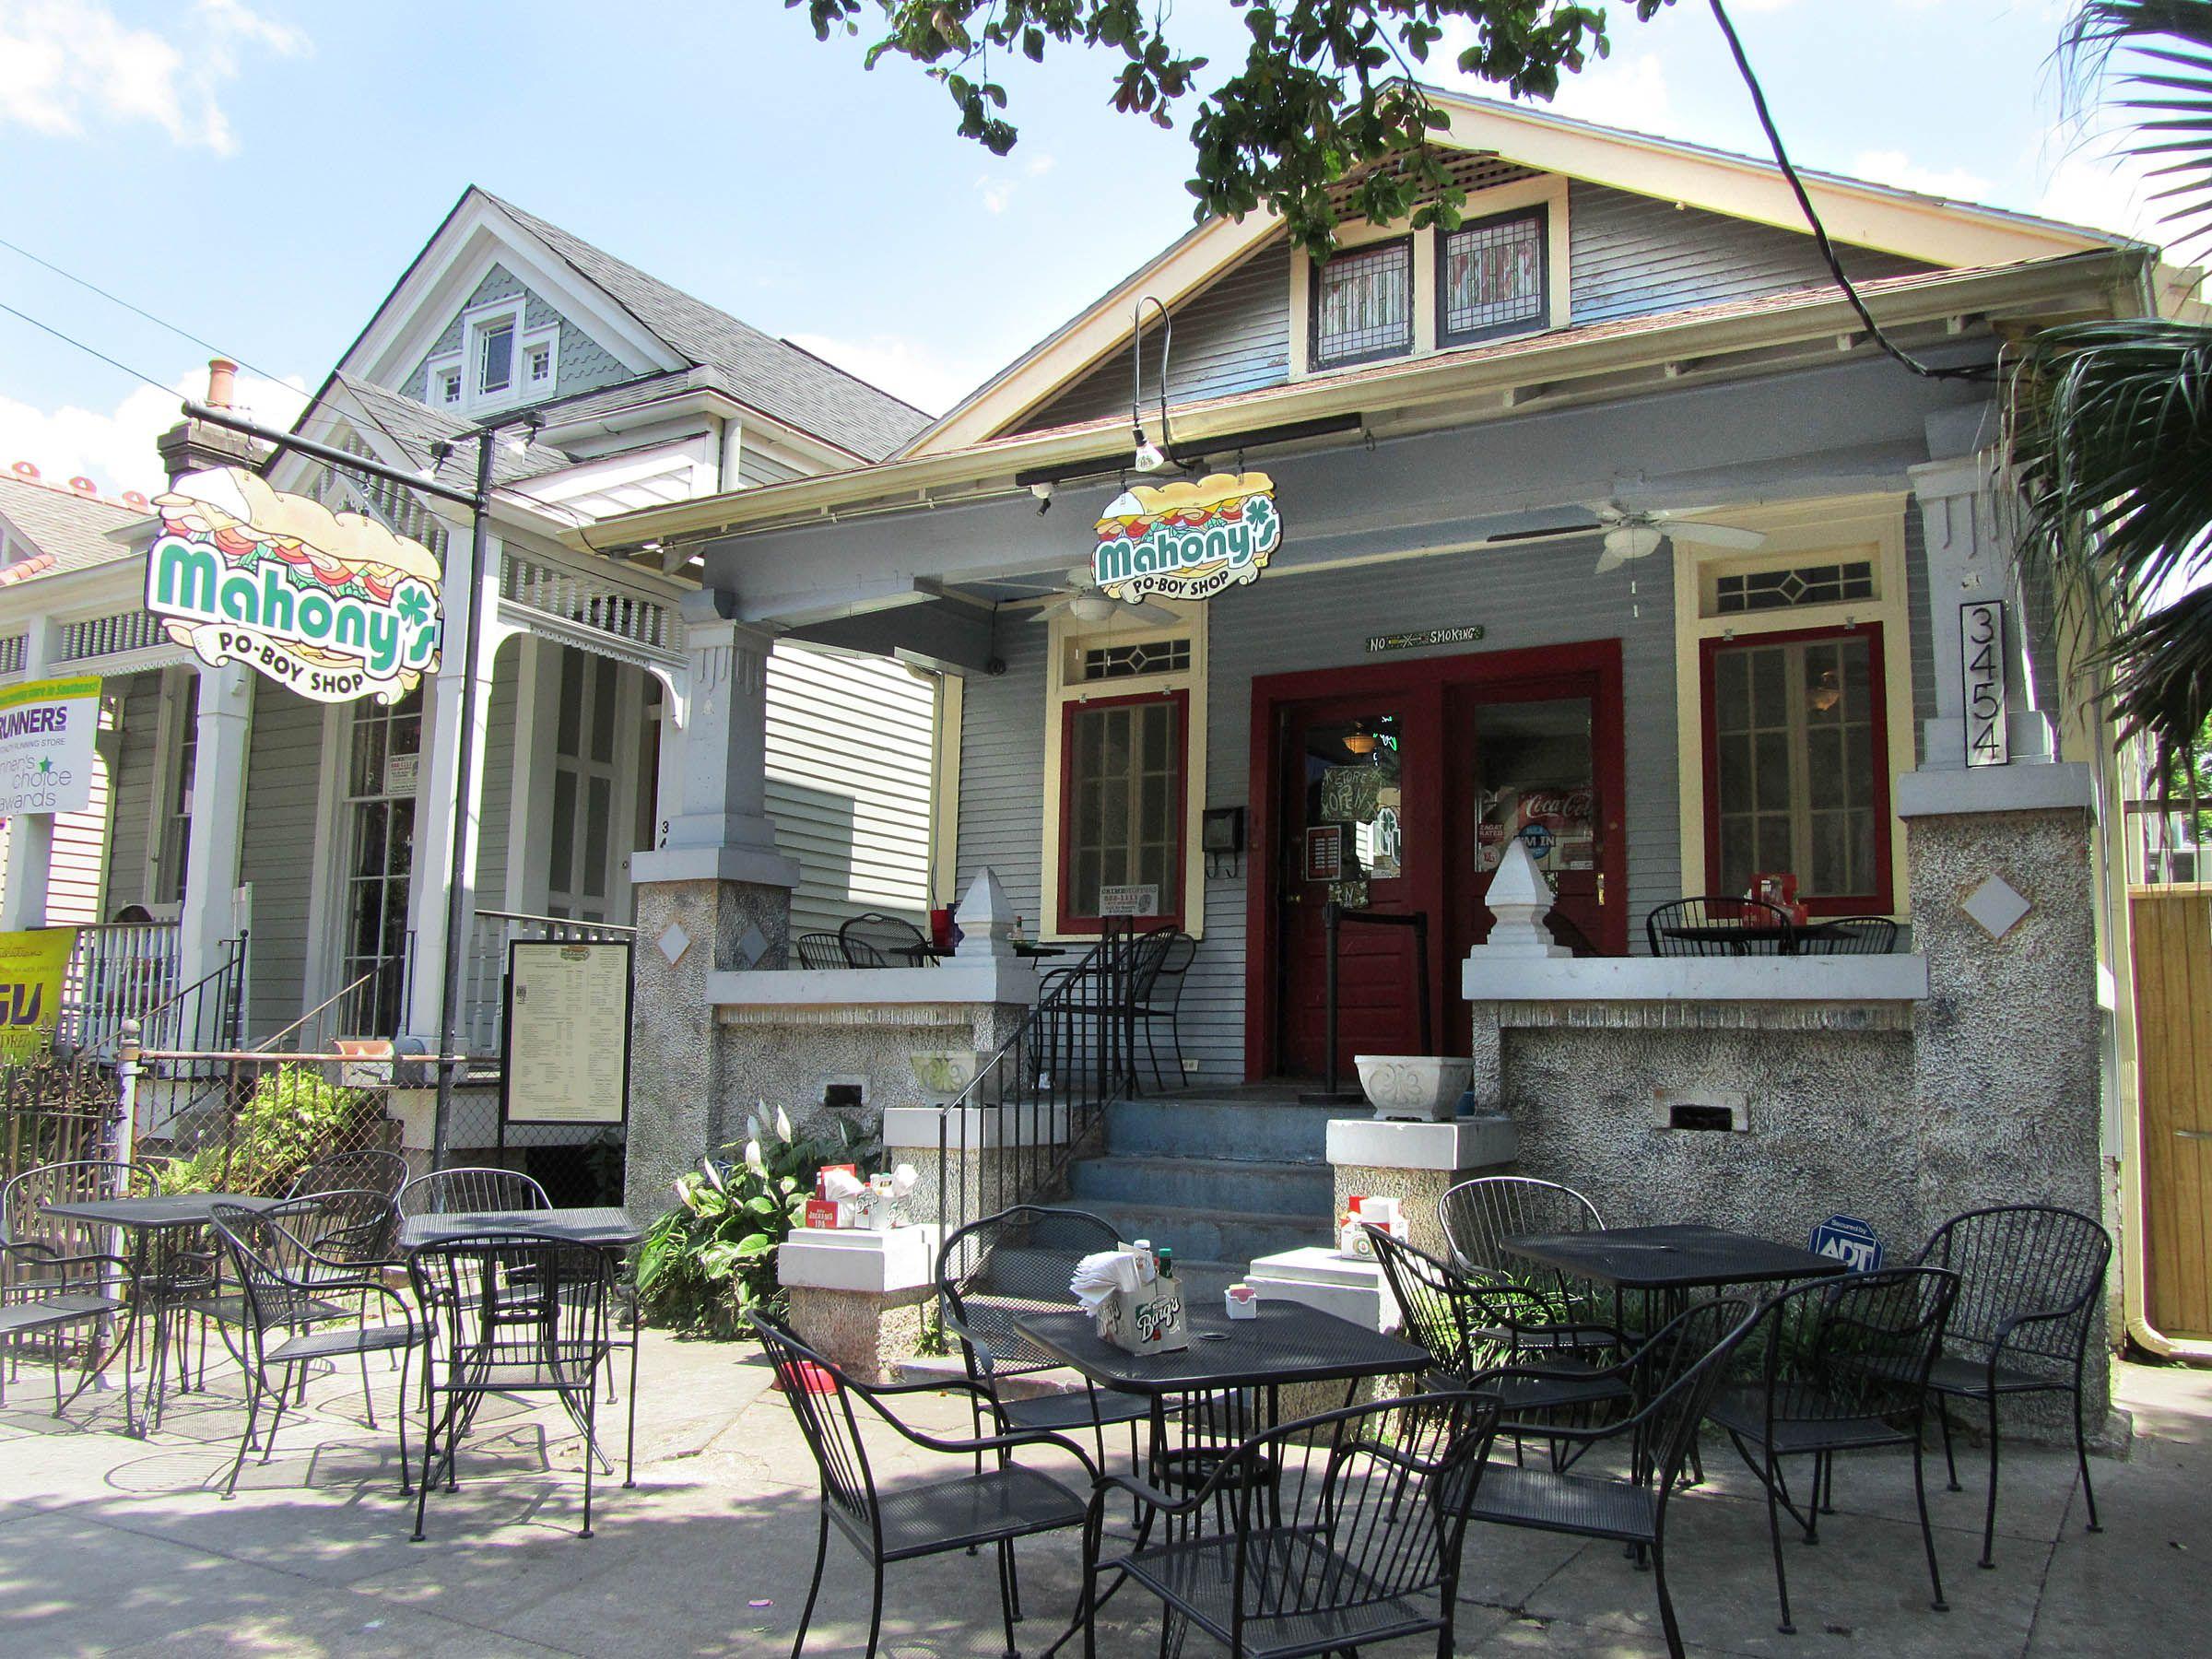 Mahoney 39 s po boy shop new orleans style new orleans - Garden district new orleans restaurants ...